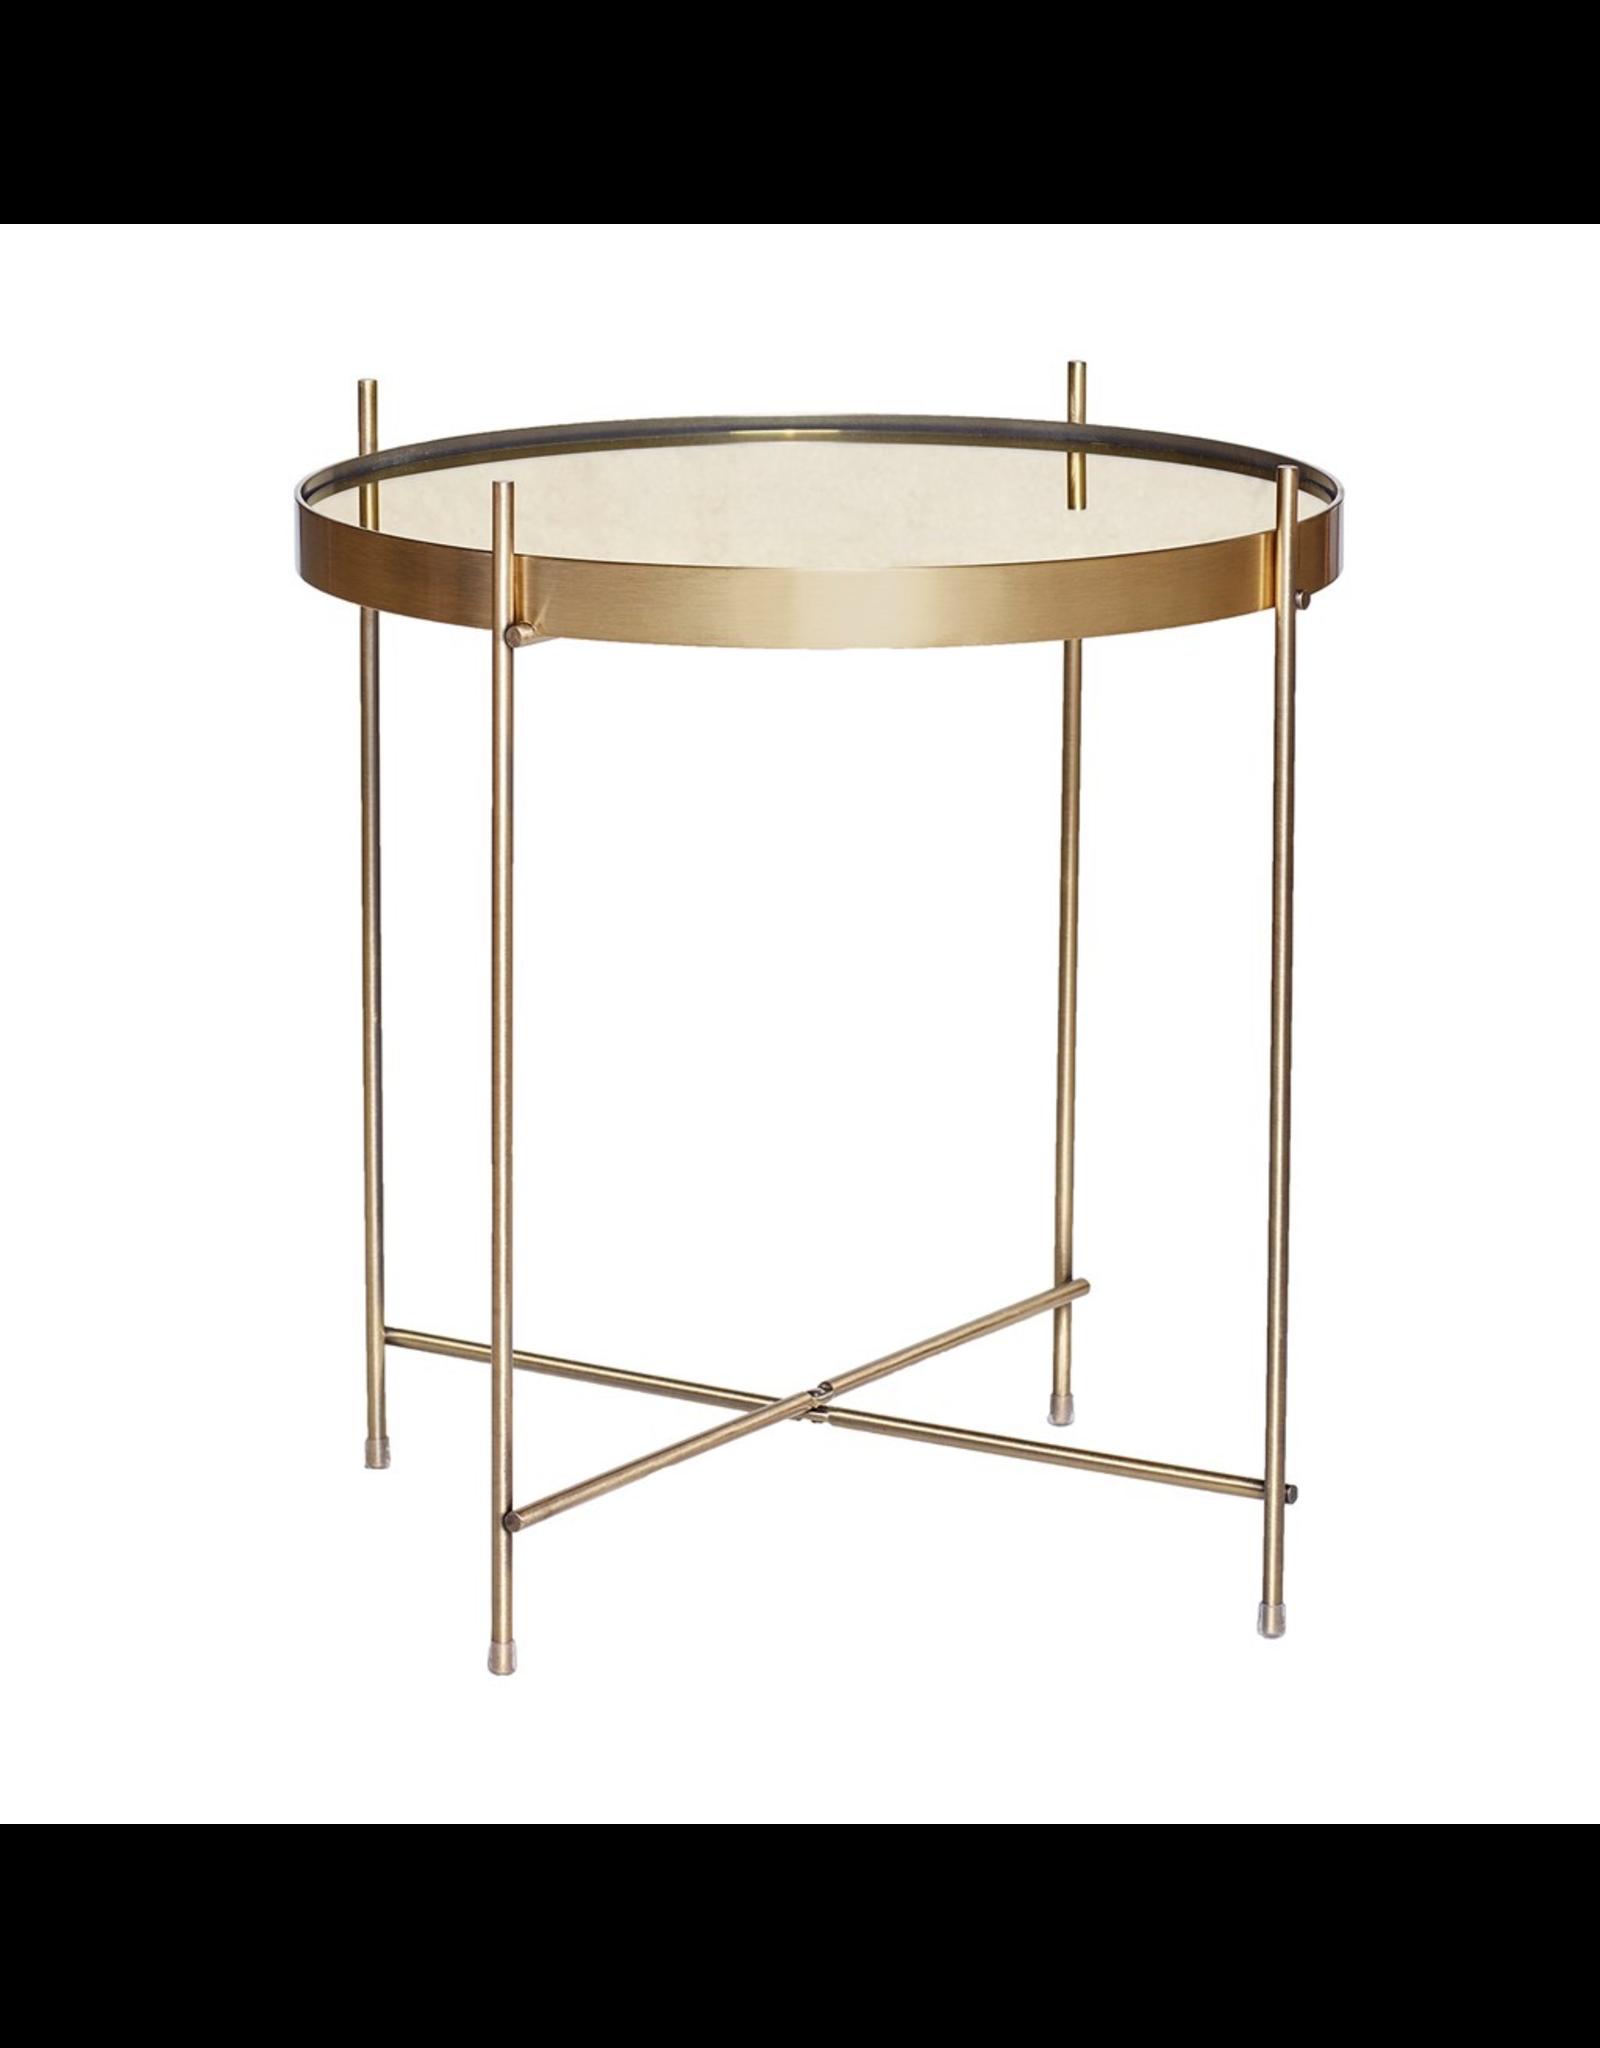 Hubsch A/S TABLE RONDE OR METAL / MIROIR